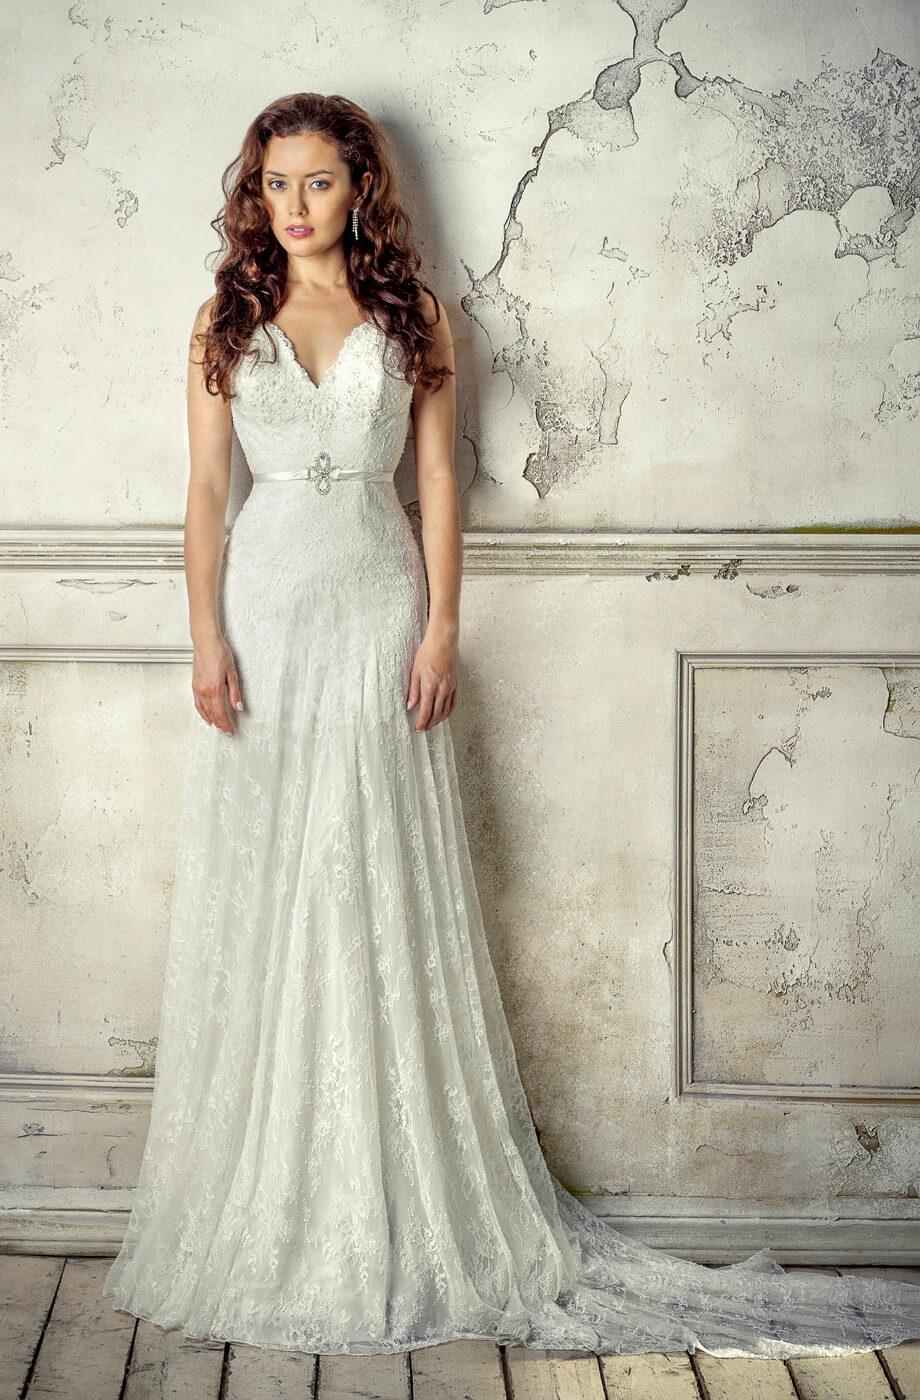 maria dubois cr atrice de robes de mari e paris lyon orl ans